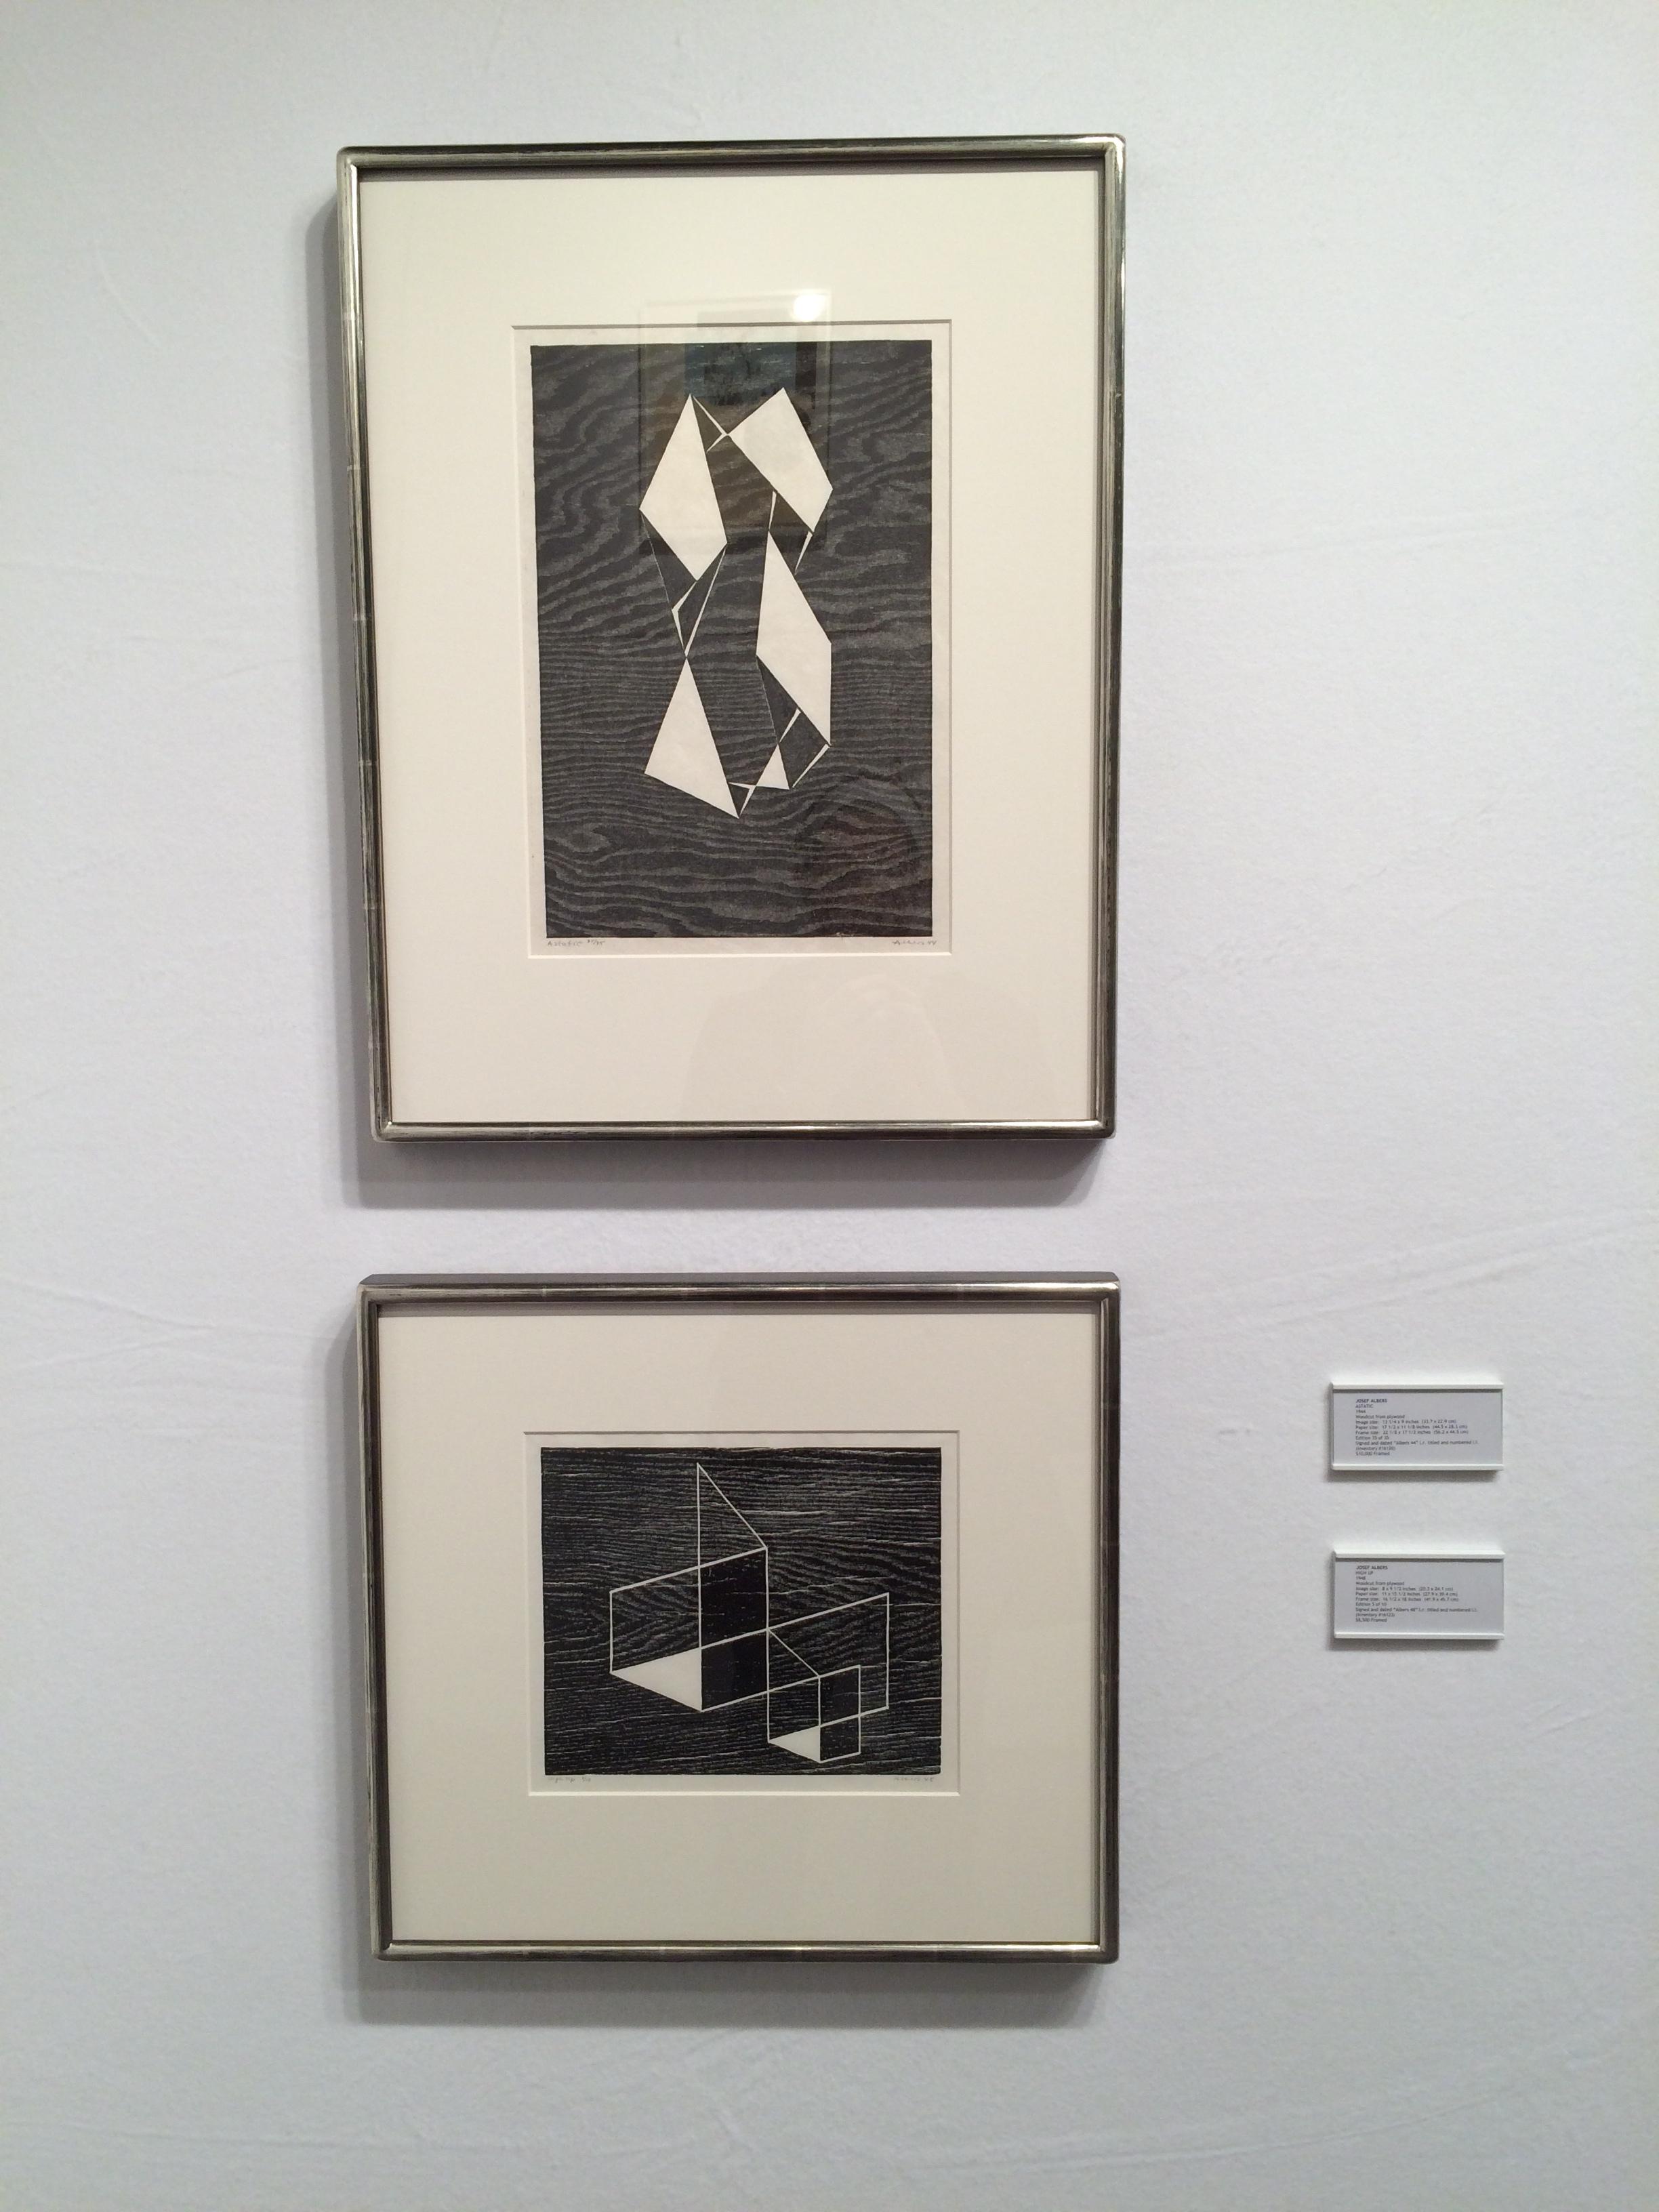 Josef Albers, Astatic + High Up